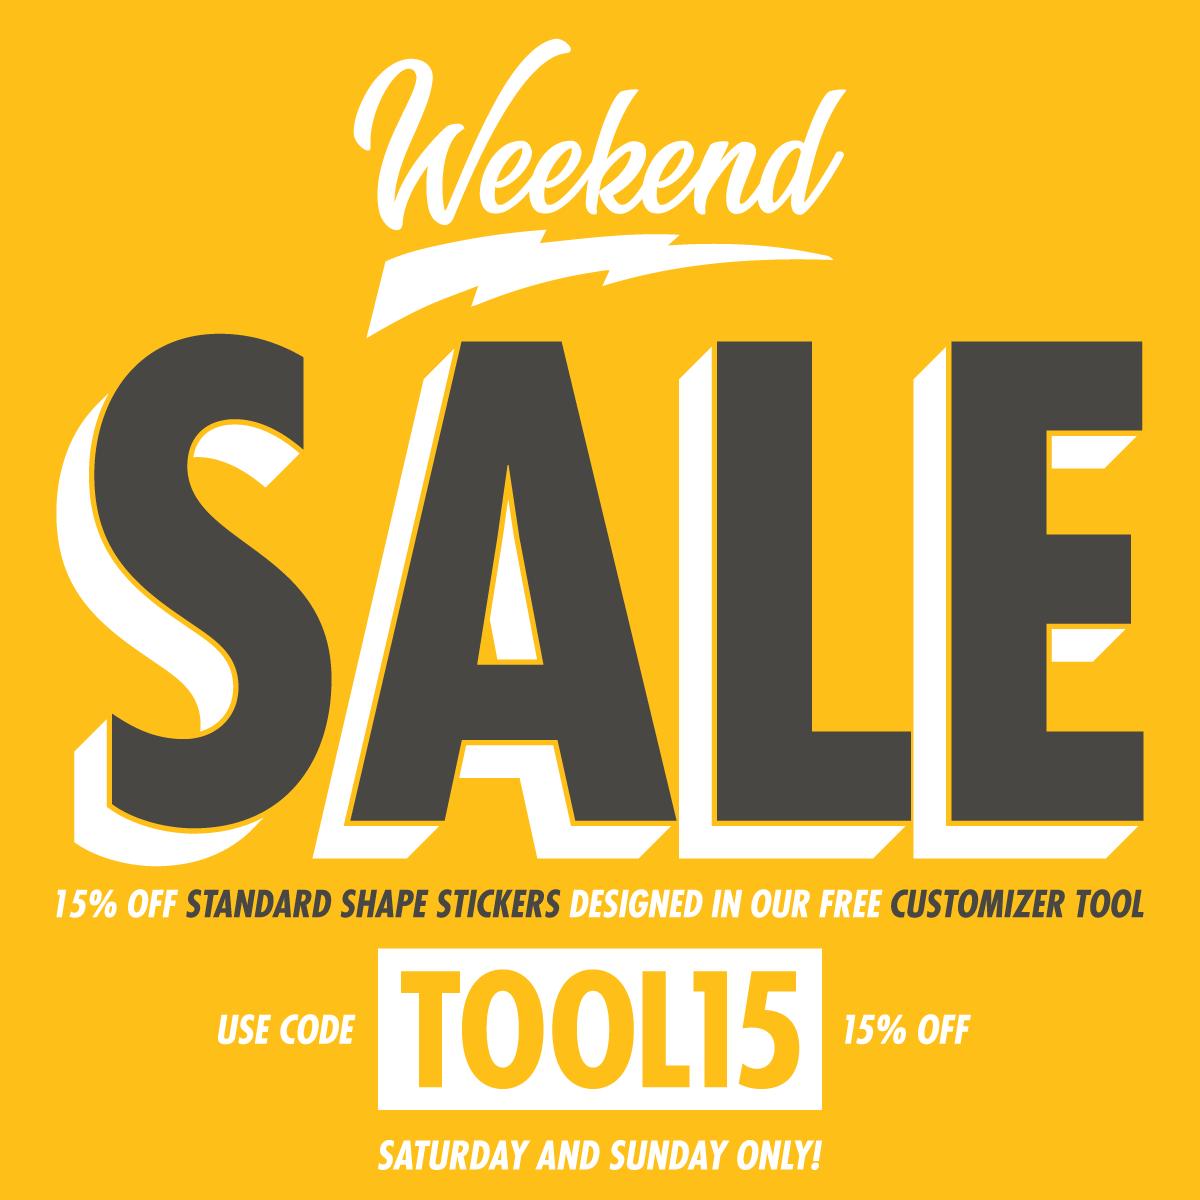 Ti9 Weekend Sale: Custom Stickers, Die Cut Stickers, Custom Sticker Printer